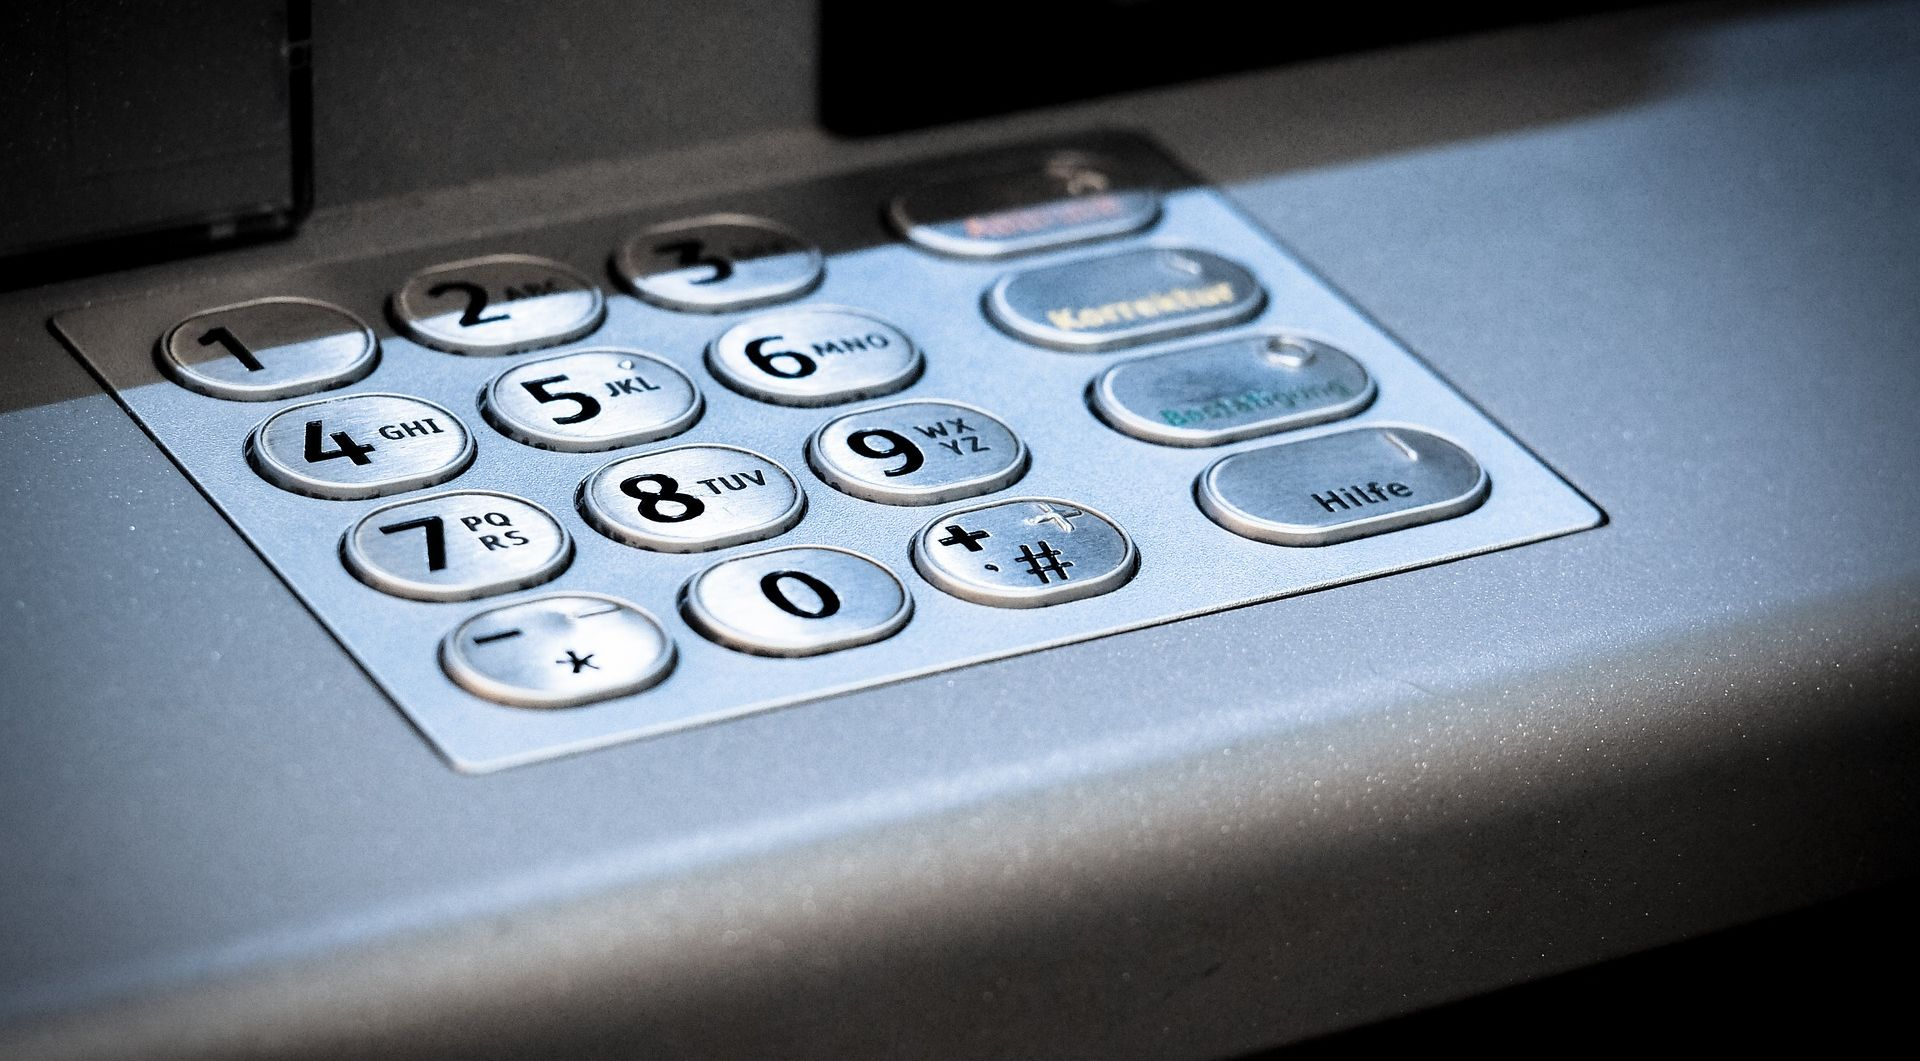 ZAGREB Noćas opljačkana dva bankomata